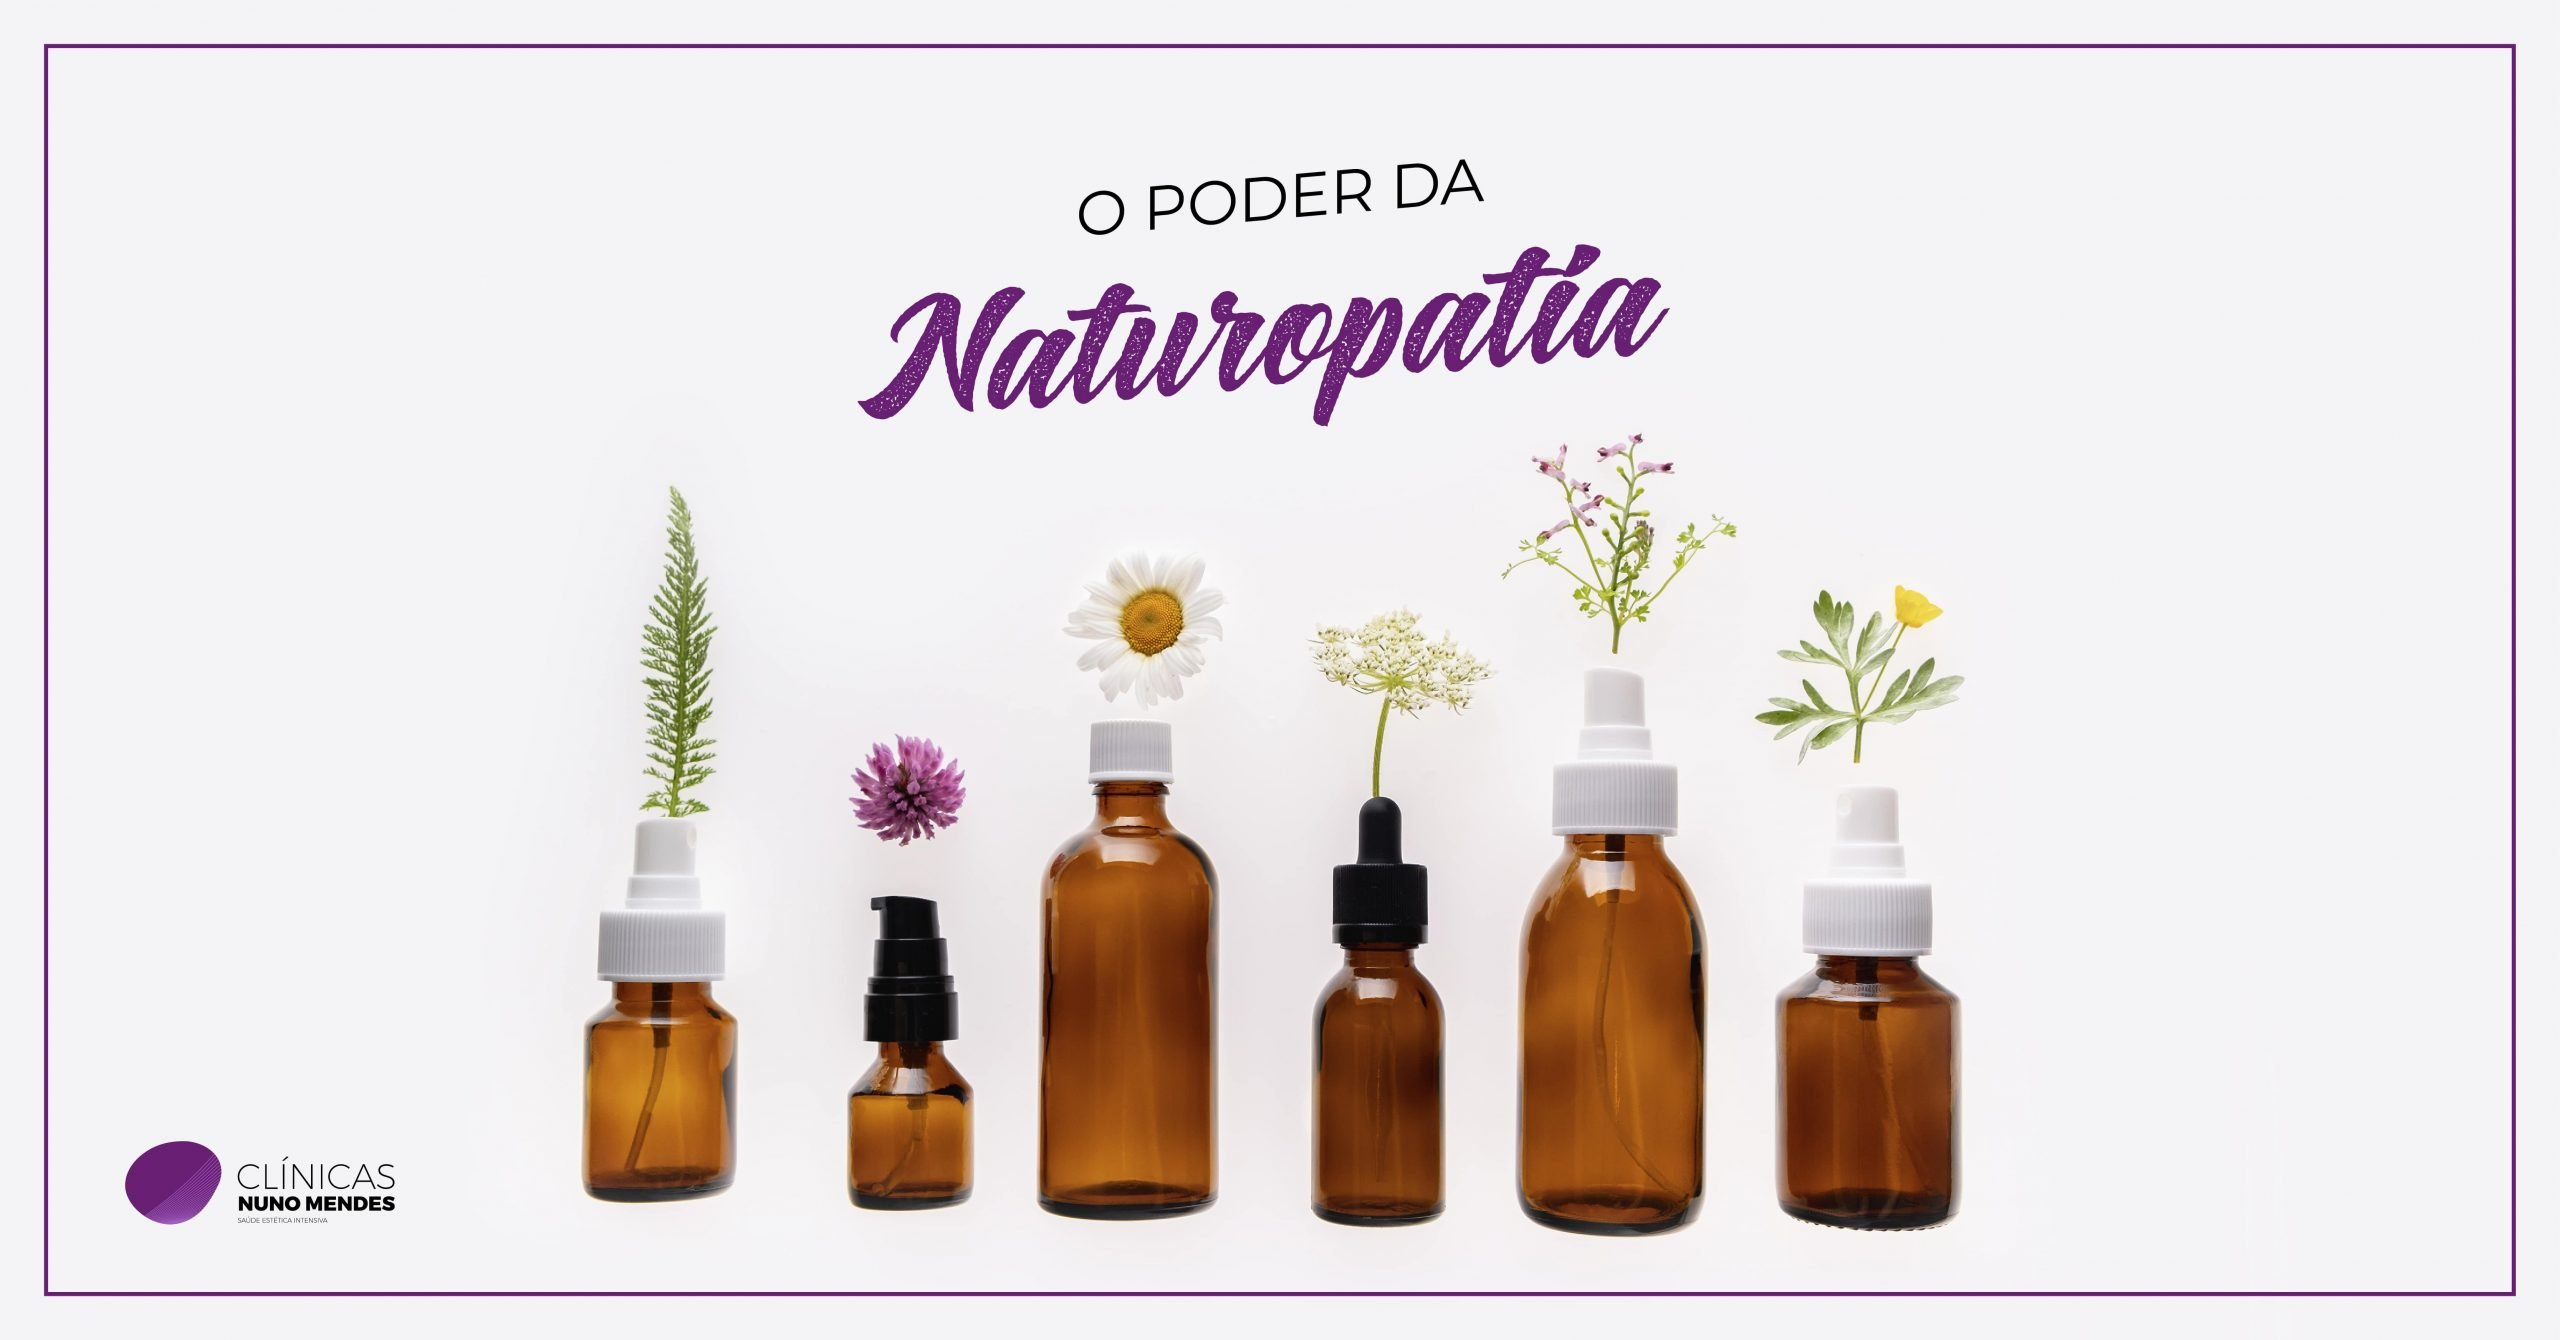 O poder da Naturopatia